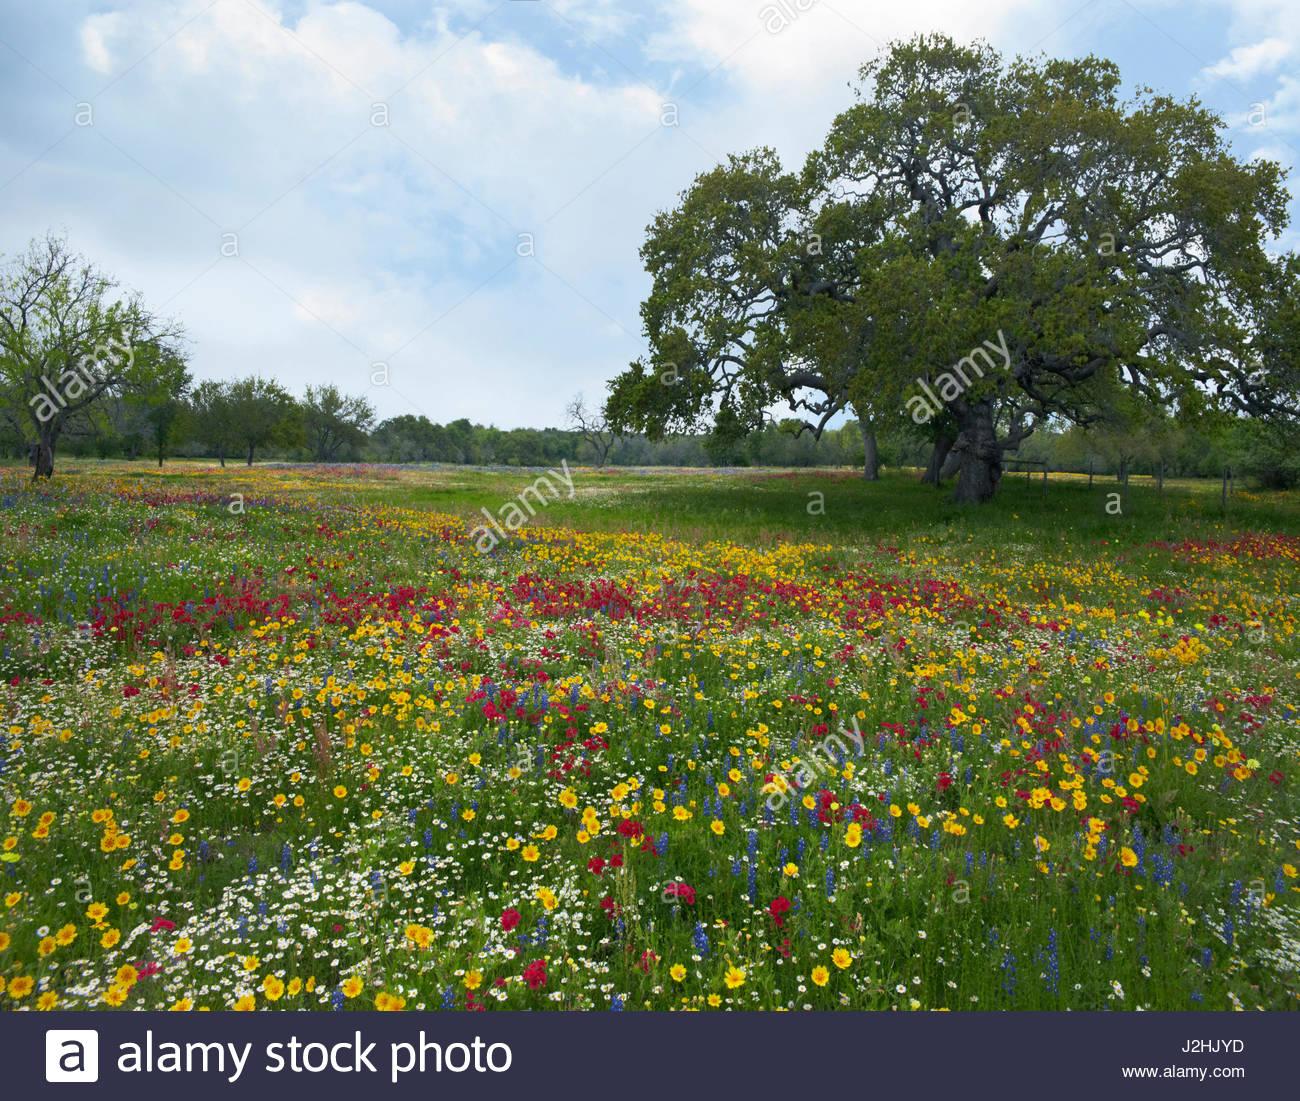 Wildflowers and oak tree near Westhoff (Dewitt County), Texas, USA - Stock Image